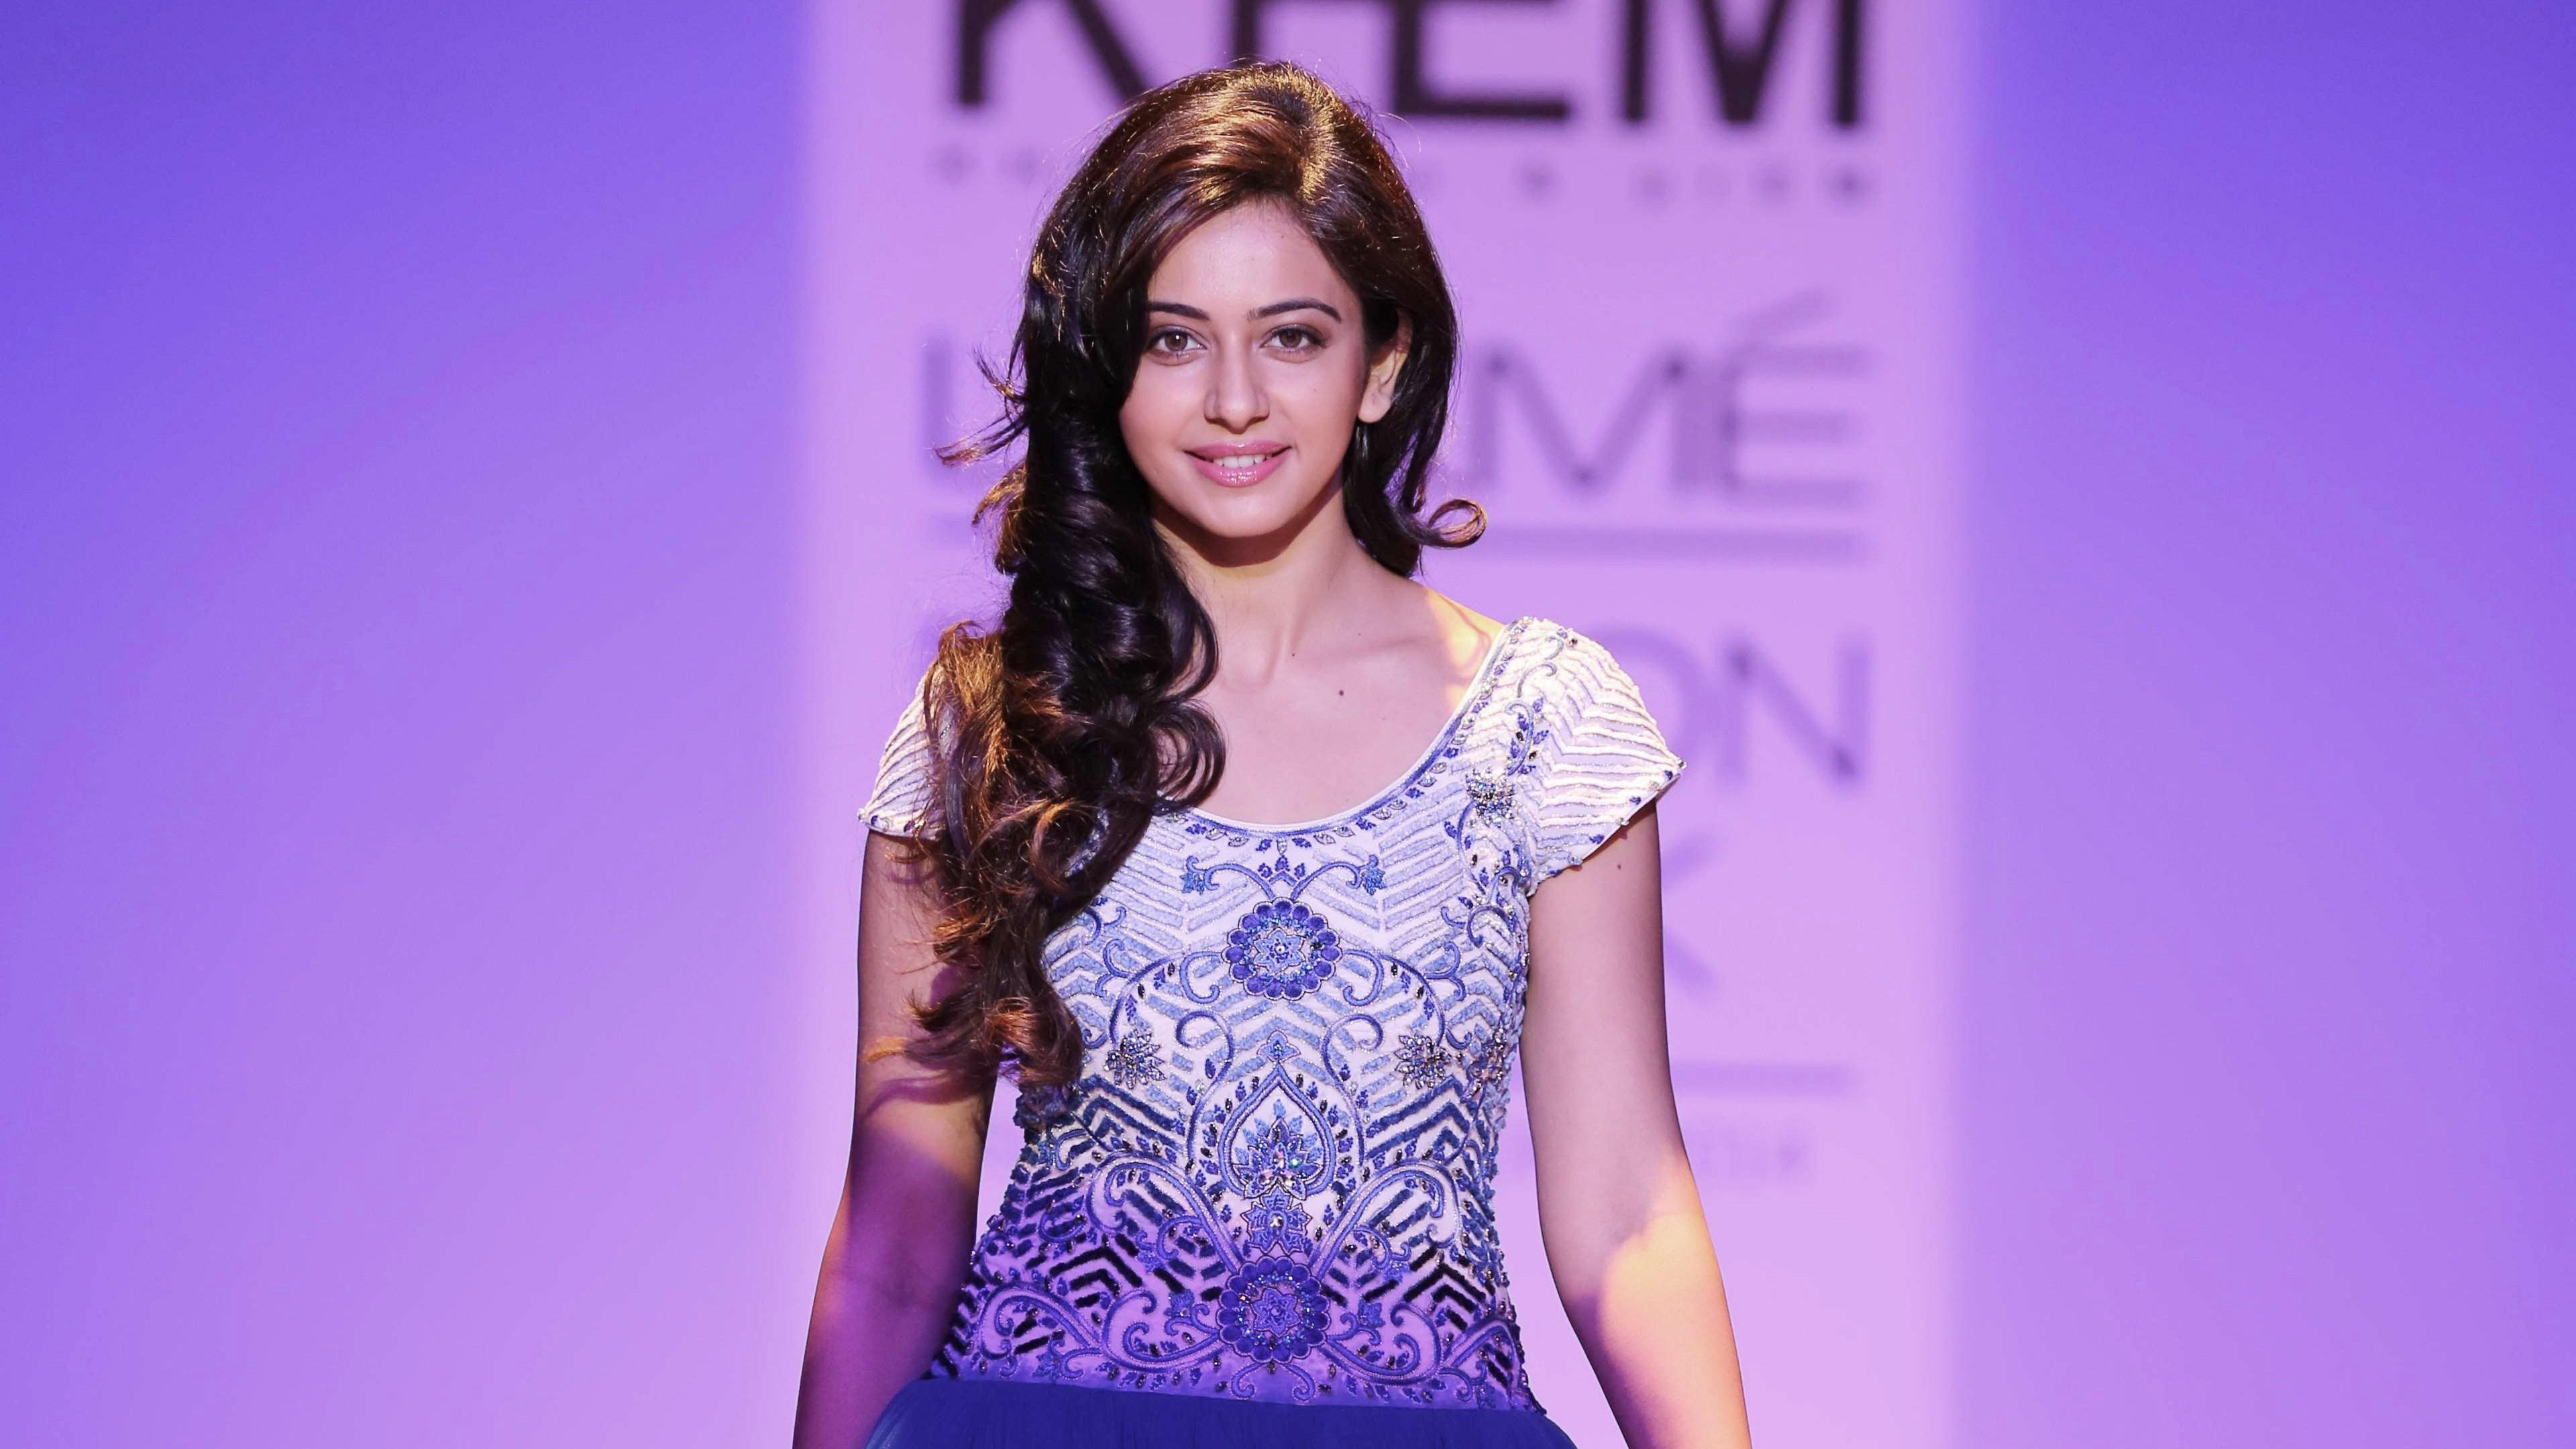 Beautiful Indian Girls Hd Wallpapers 1080p Source - Rakul Preet Singh Mobile , HD Wallpaper & Backgrounds